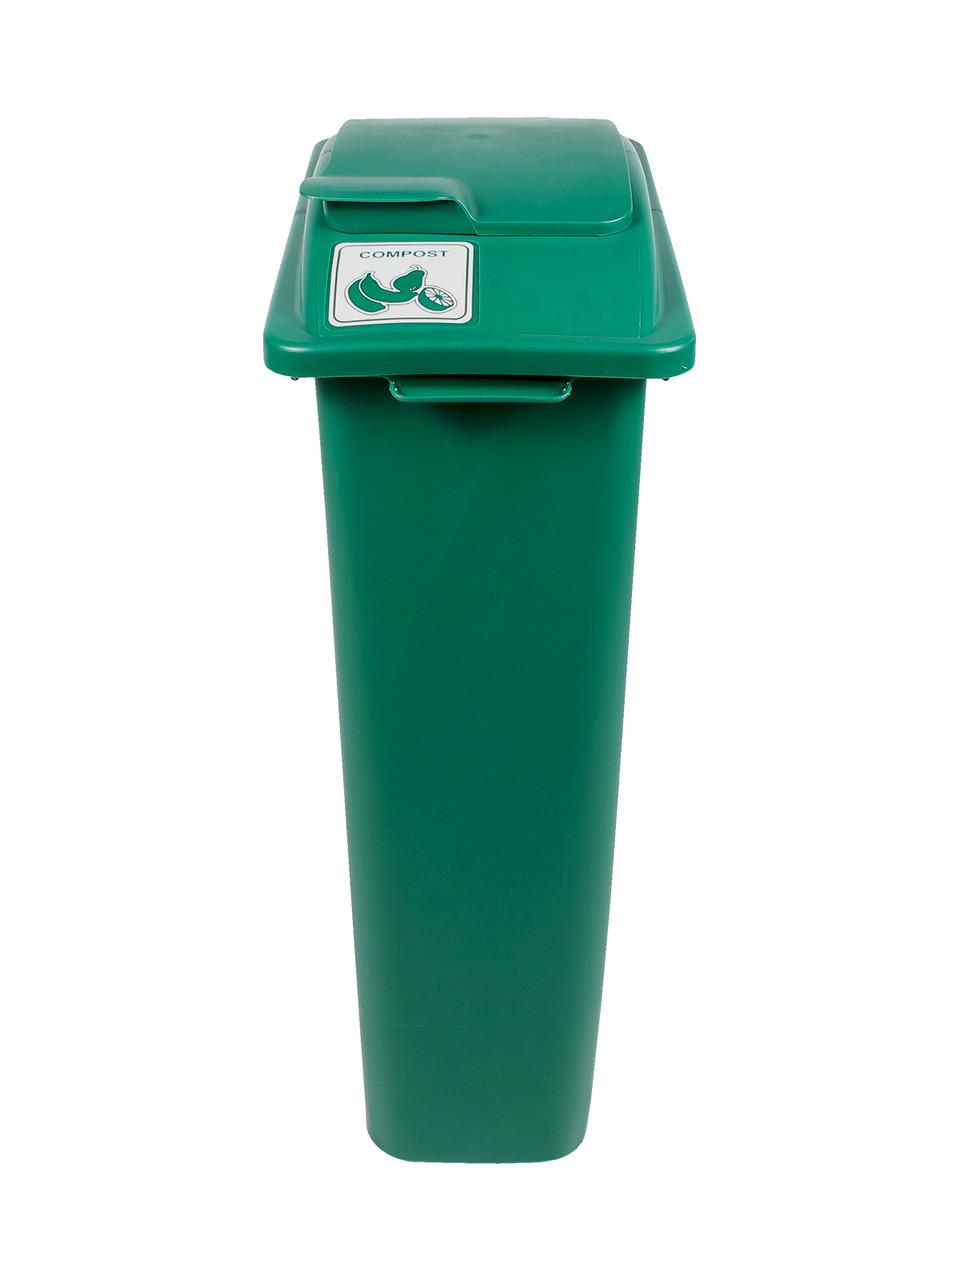 23 Gallon Green Skinny Simple Sort Compost Bin Lift Top